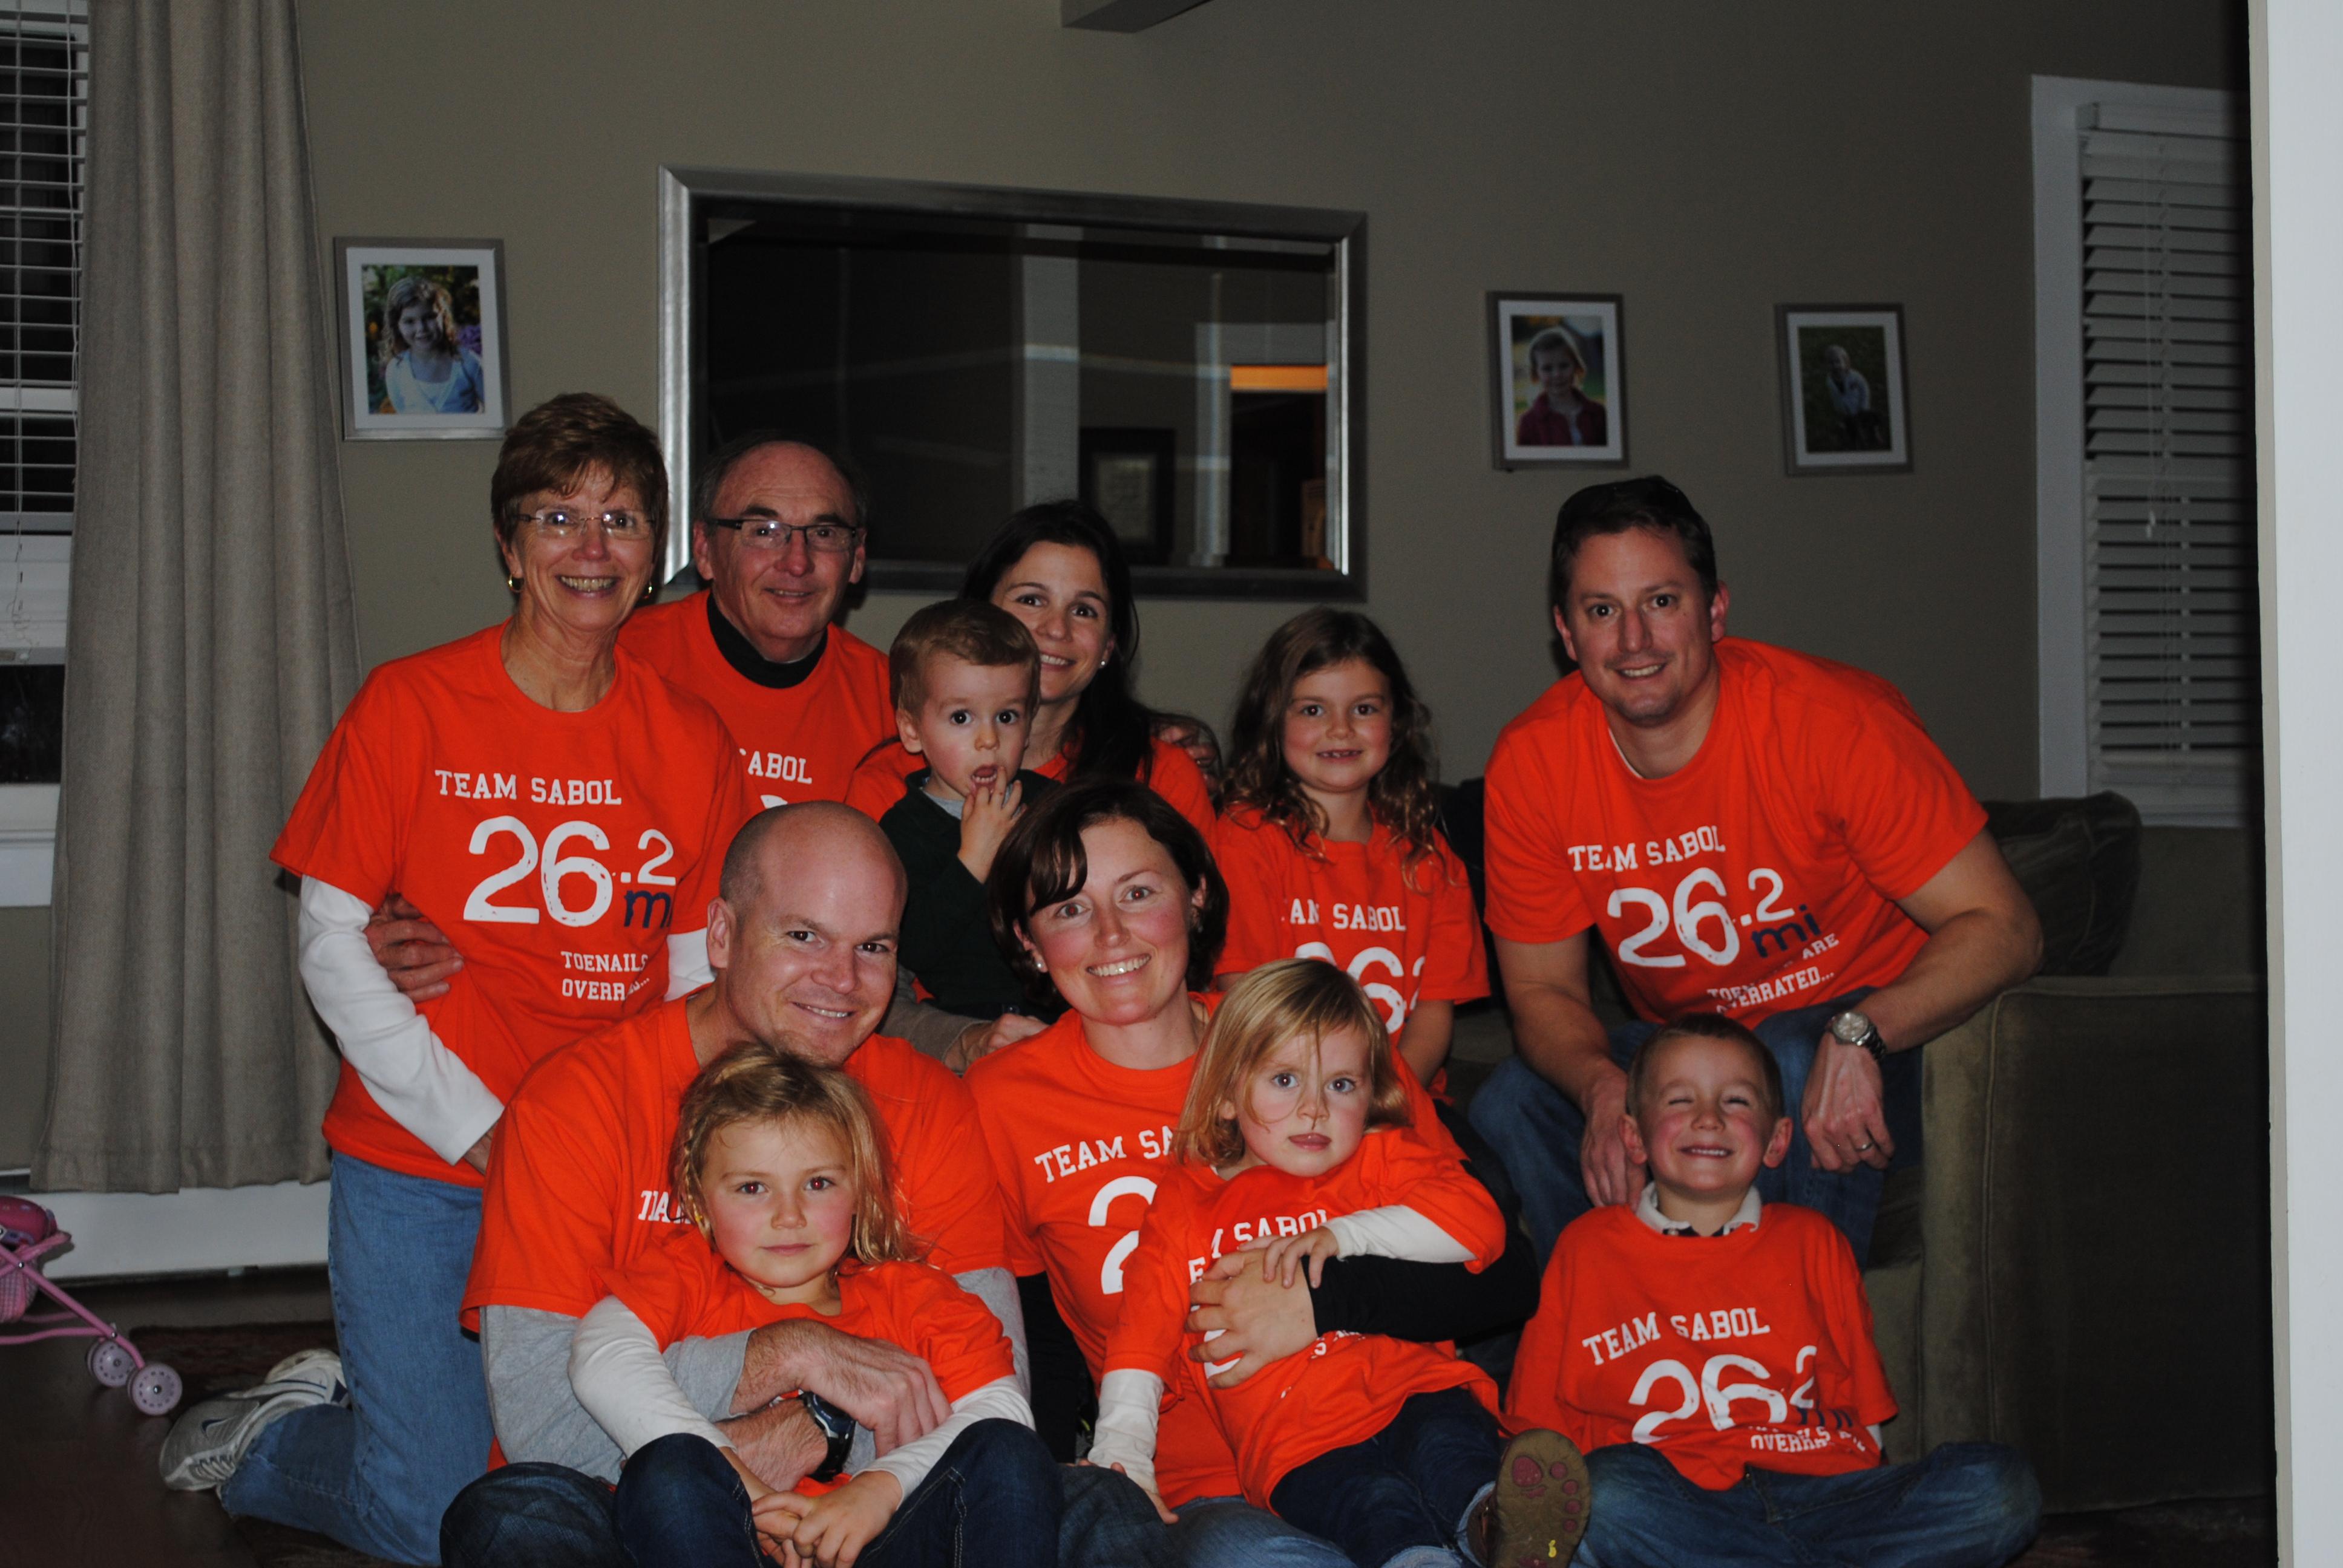 T shirt design help - Marathon Family T Shirt Photo